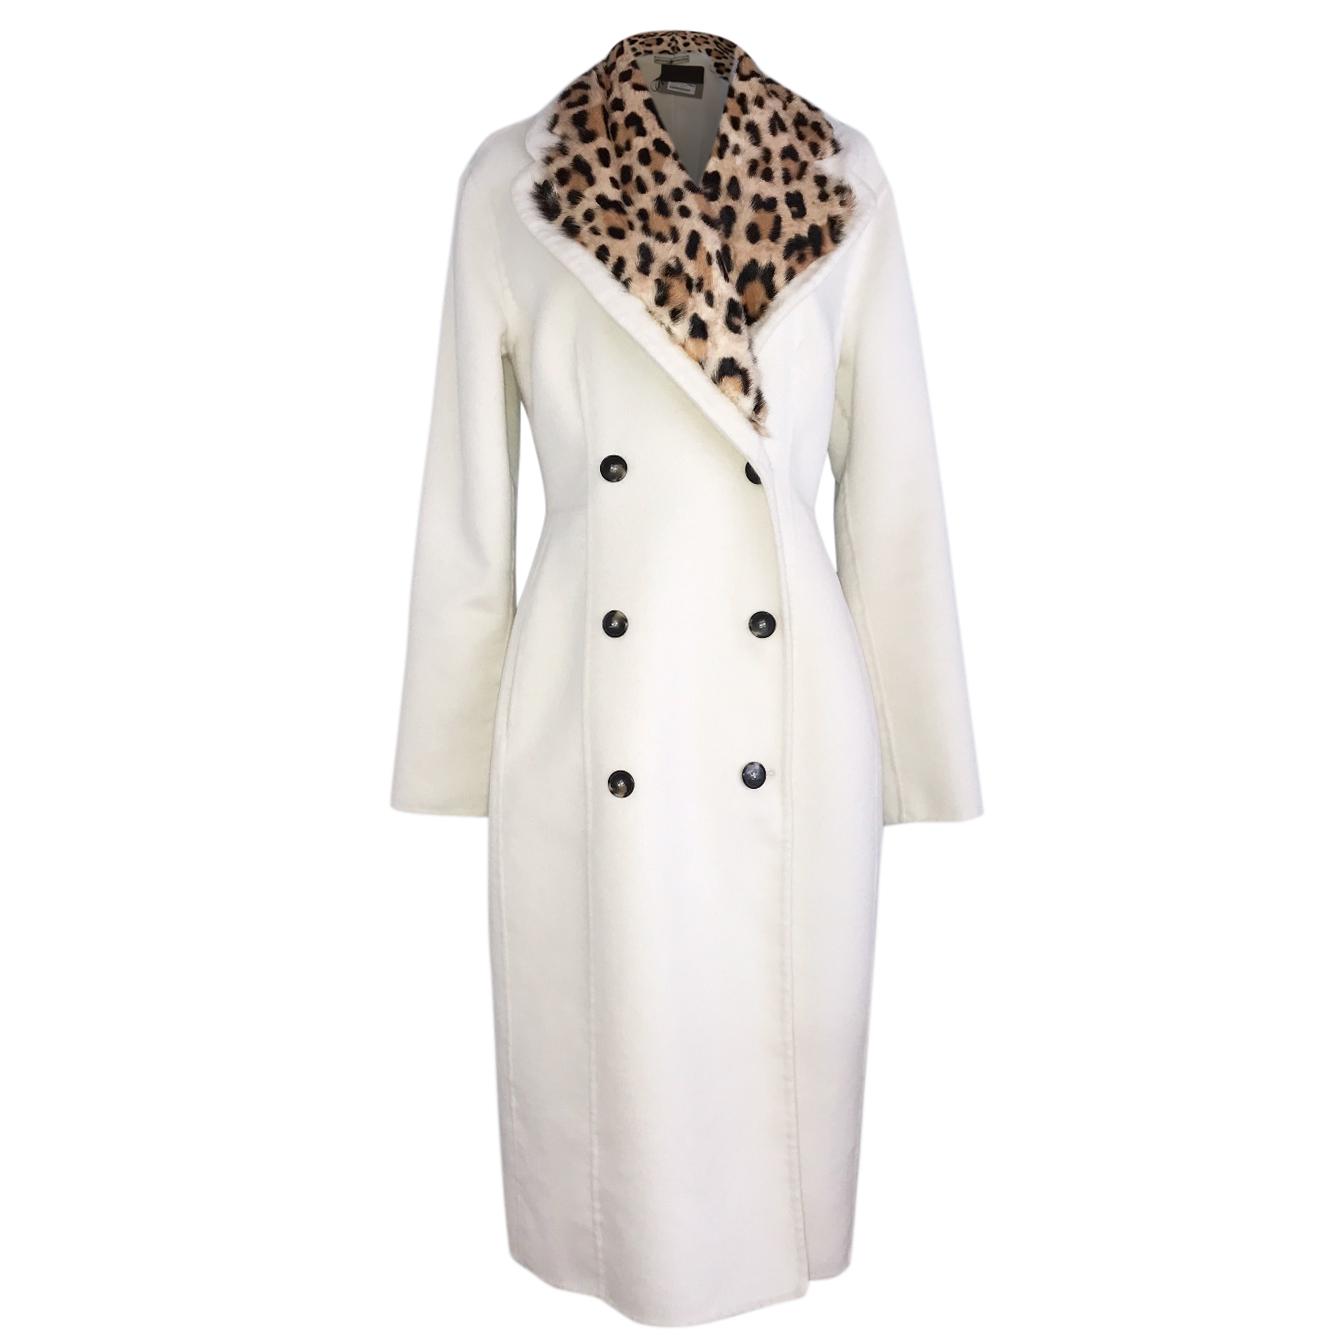 best loved 3b231 5f131 Ermanno Scervino cream/leopard coat